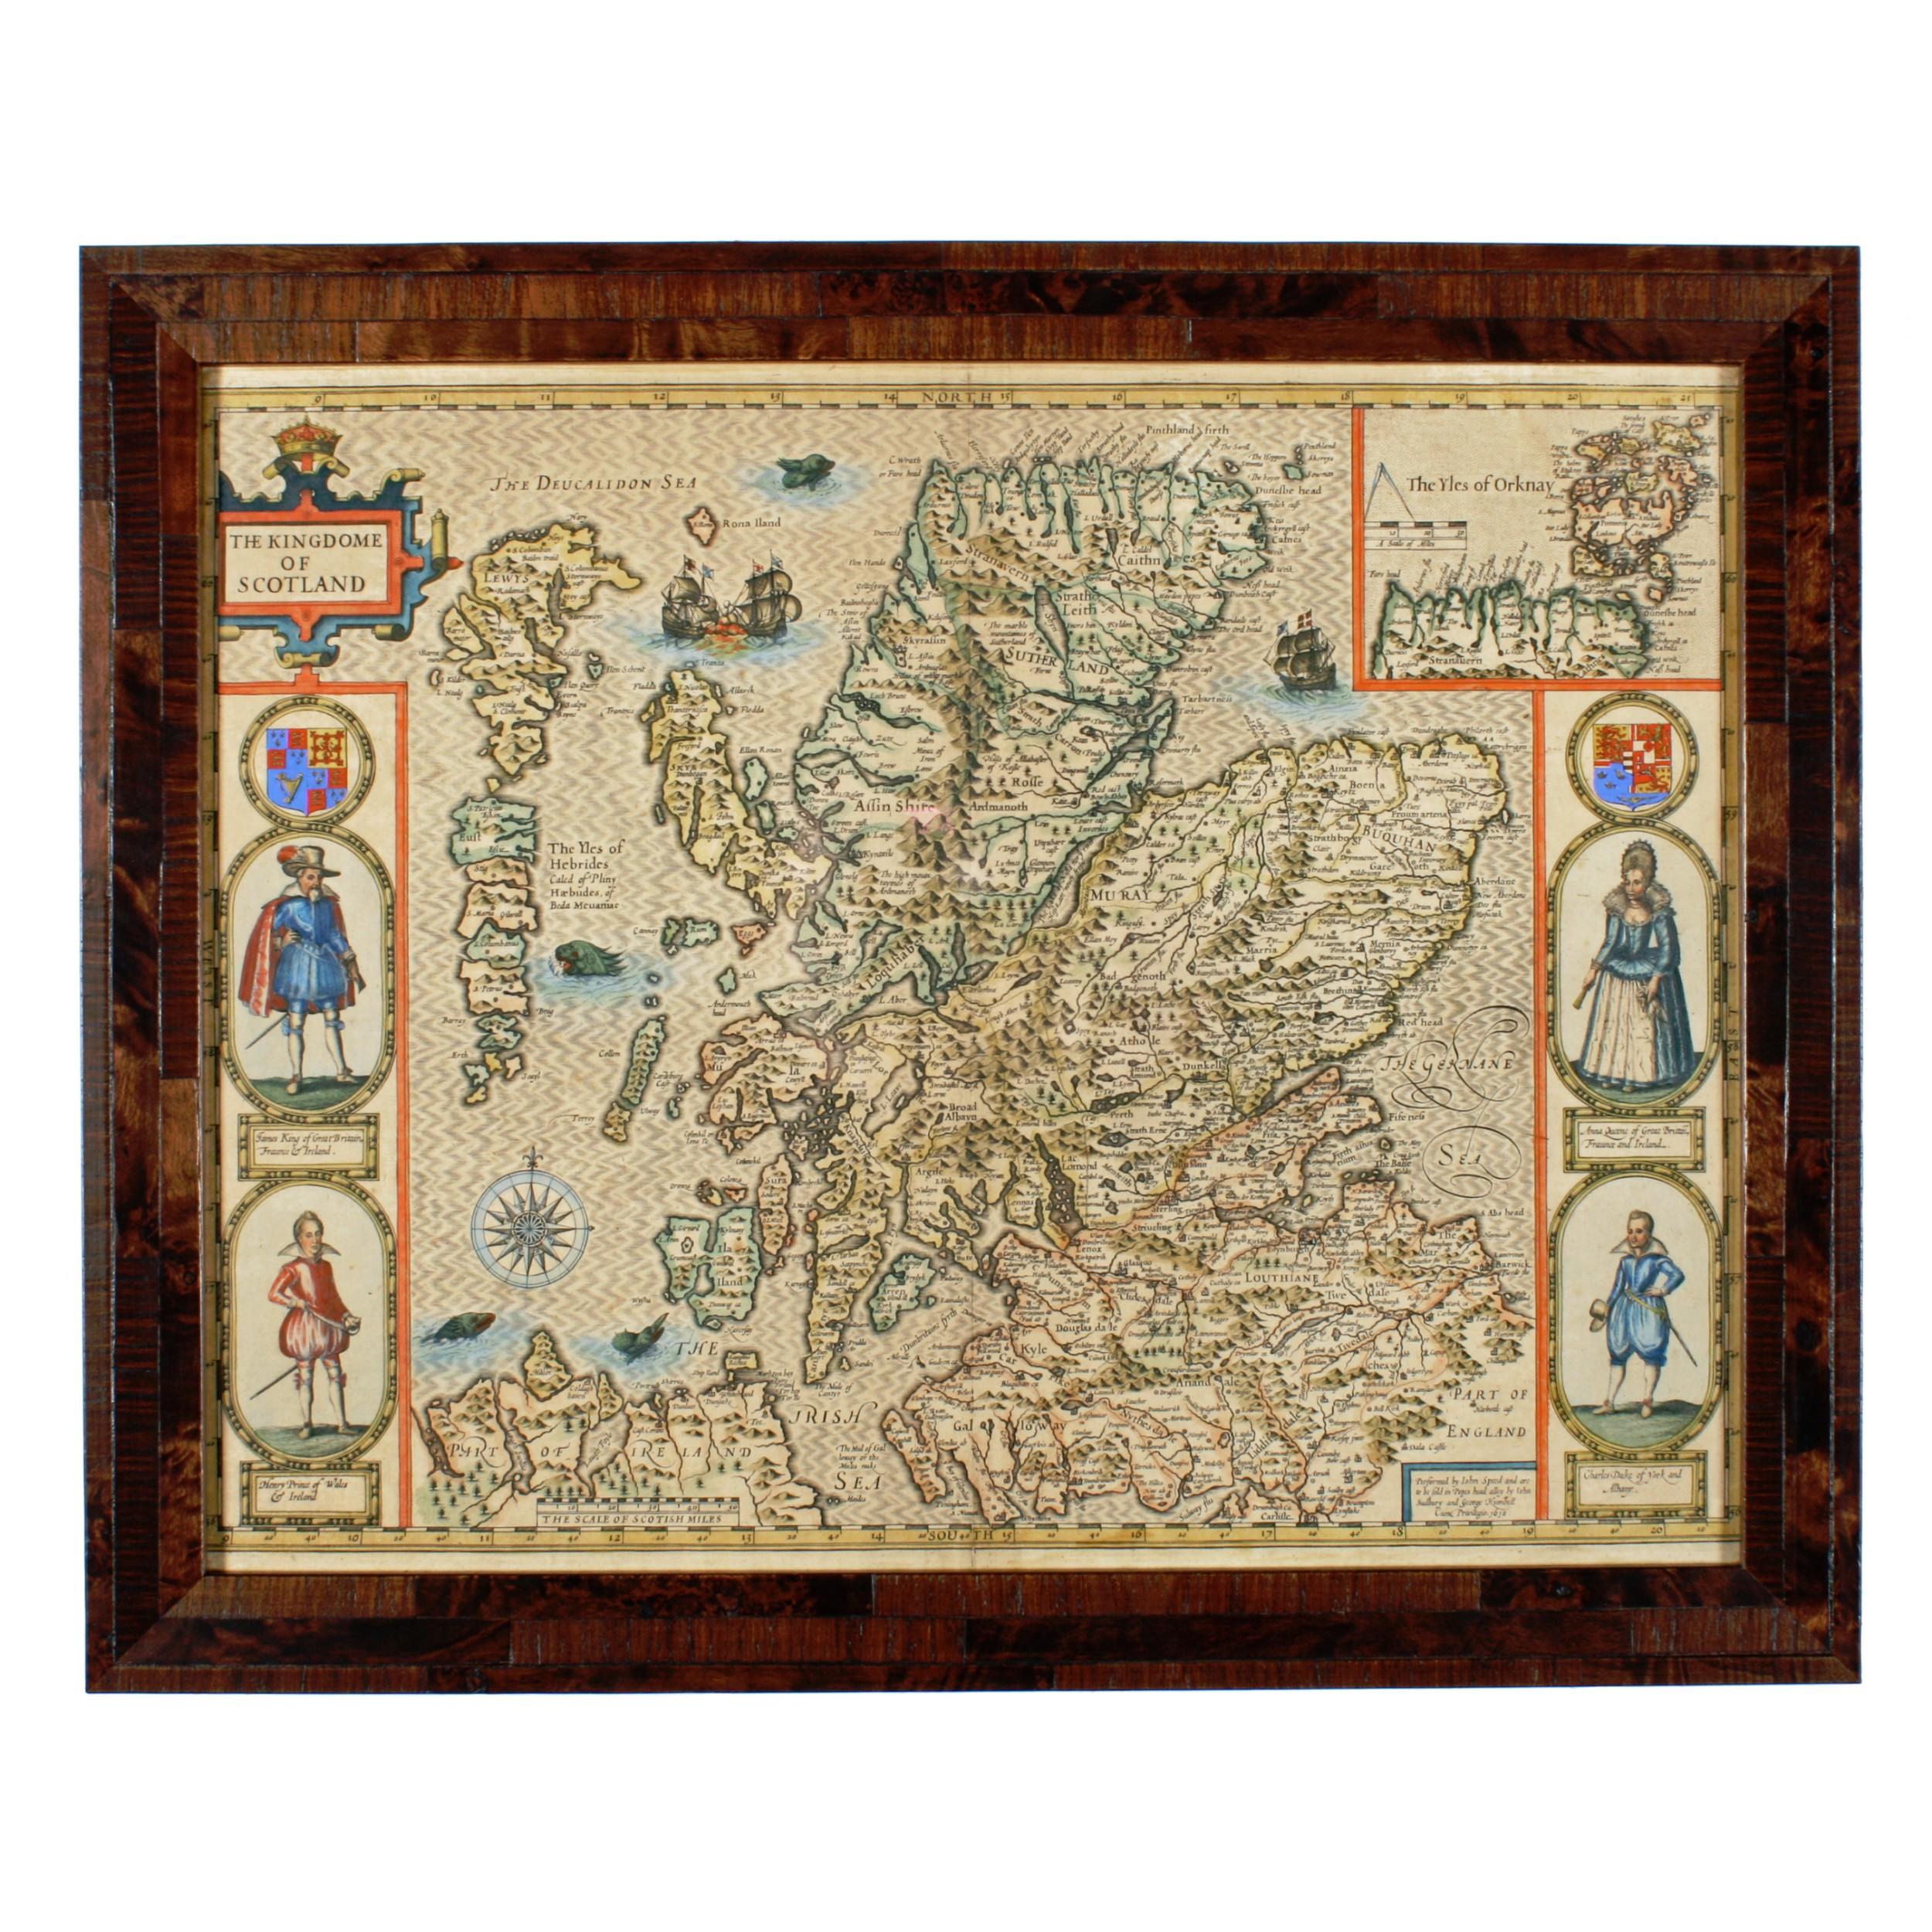 john speed 'the kingdome of scotland' map